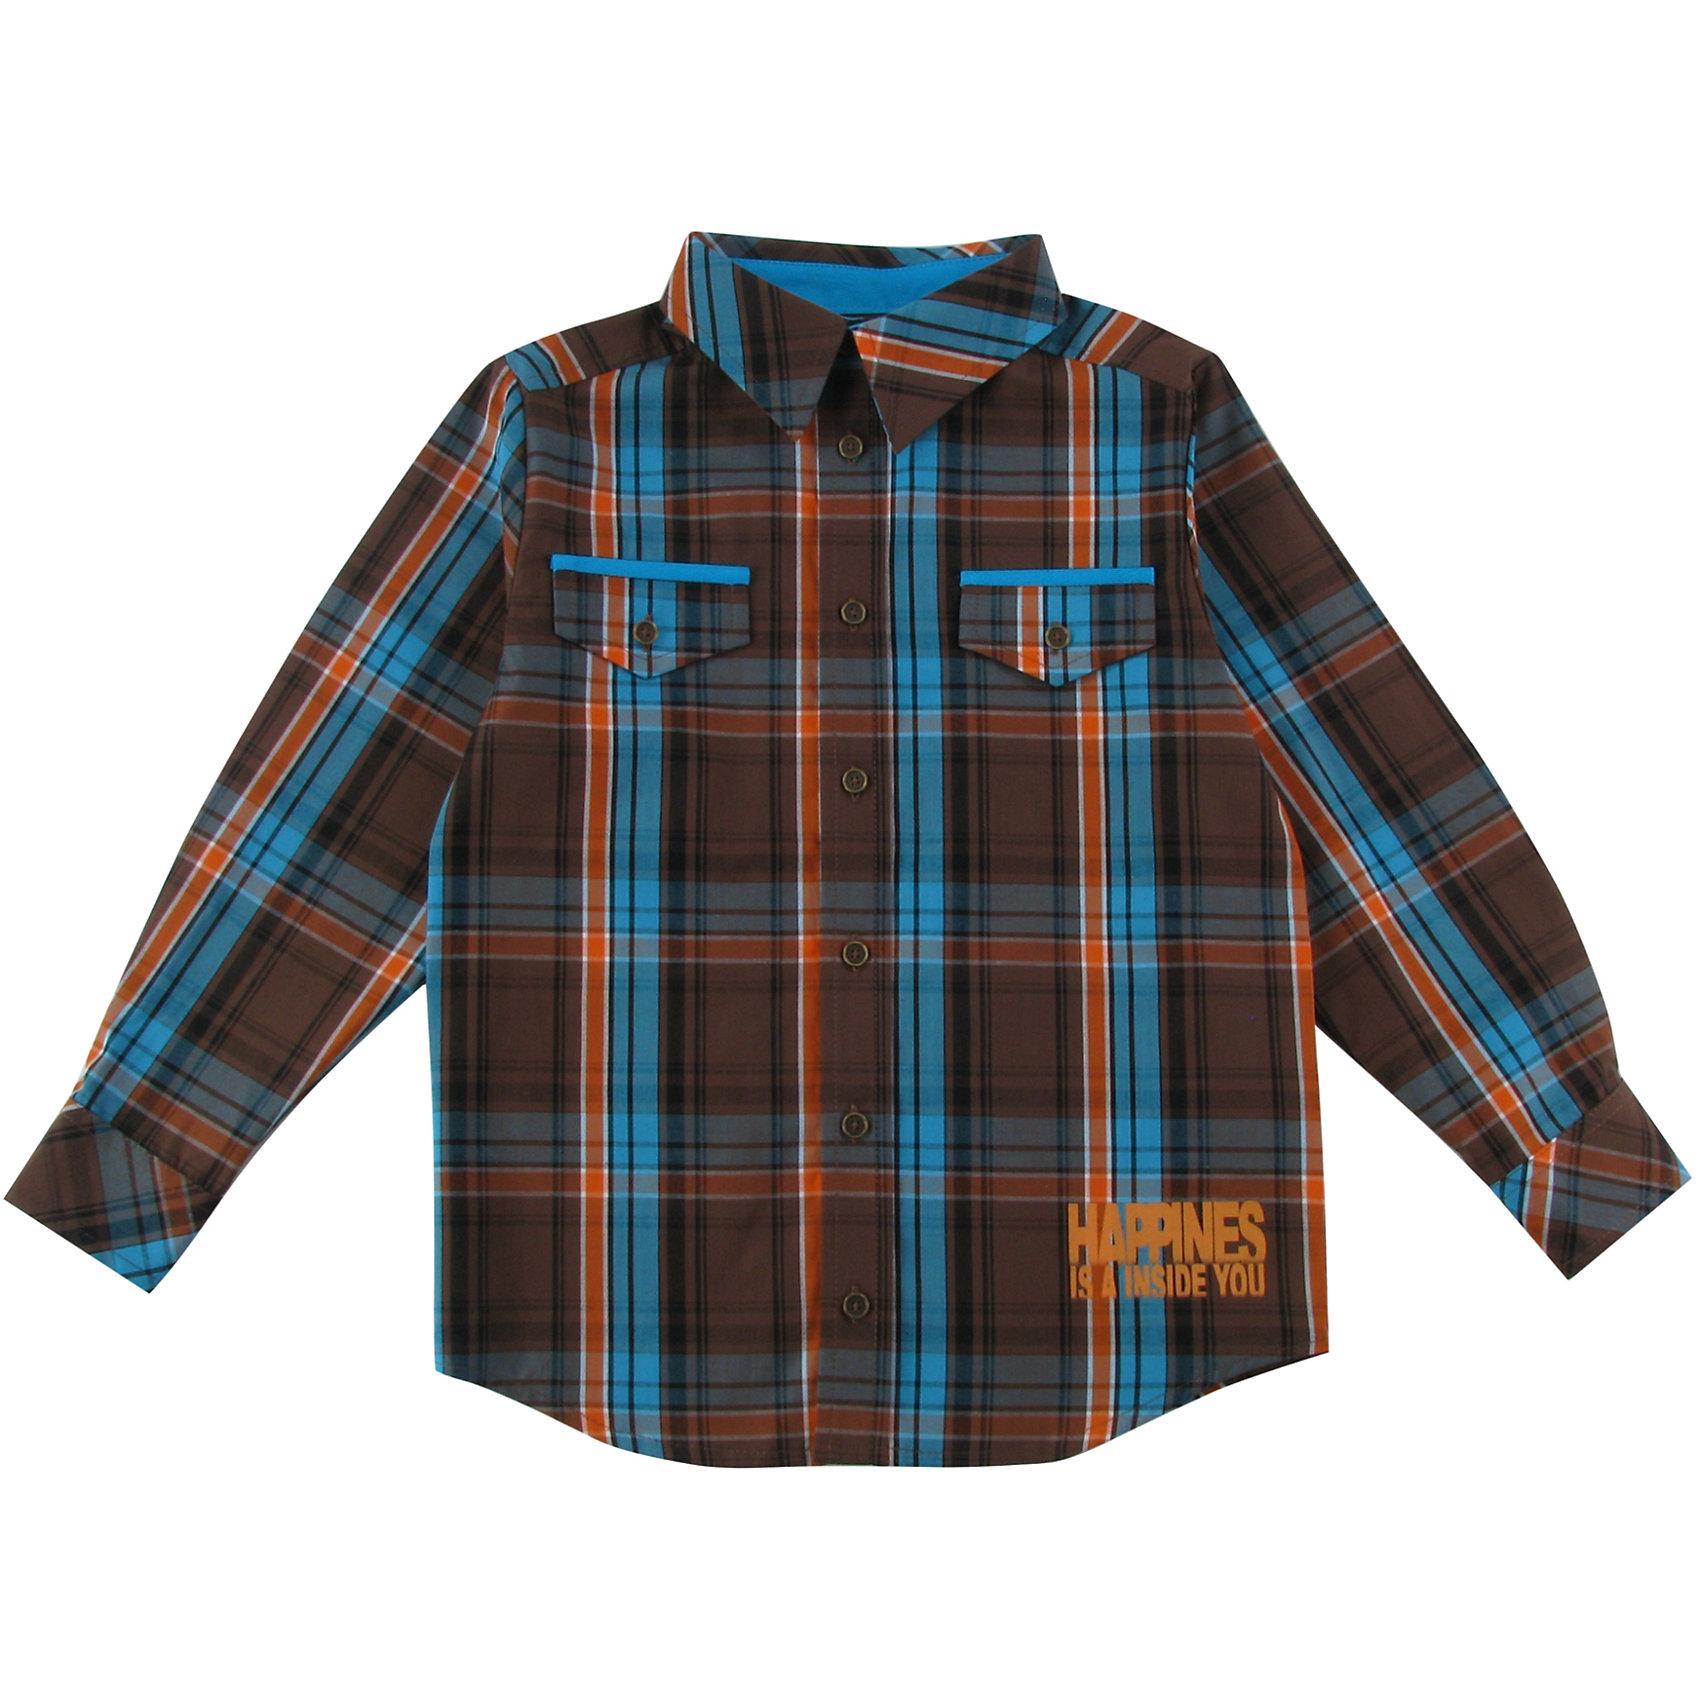 Рубашка для мальчика WojcikБлузки и рубашки<br>Рубашка для мальчика Wojcik<br>Состав:<br>Хлопок 100%<br><br>Ширина мм: 174<br>Глубина мм: 10<br>Высота мм: 169<br>Вес г: 157<br>Цвет: белый<br>Возраст от месяцев: 96<br>Возраст до месяцев: 108<br>Пол: Мужской<br>Возраст: Детский<br>Размер: 134,92,98,104,110,116,122,128<br>SKU: 5592105